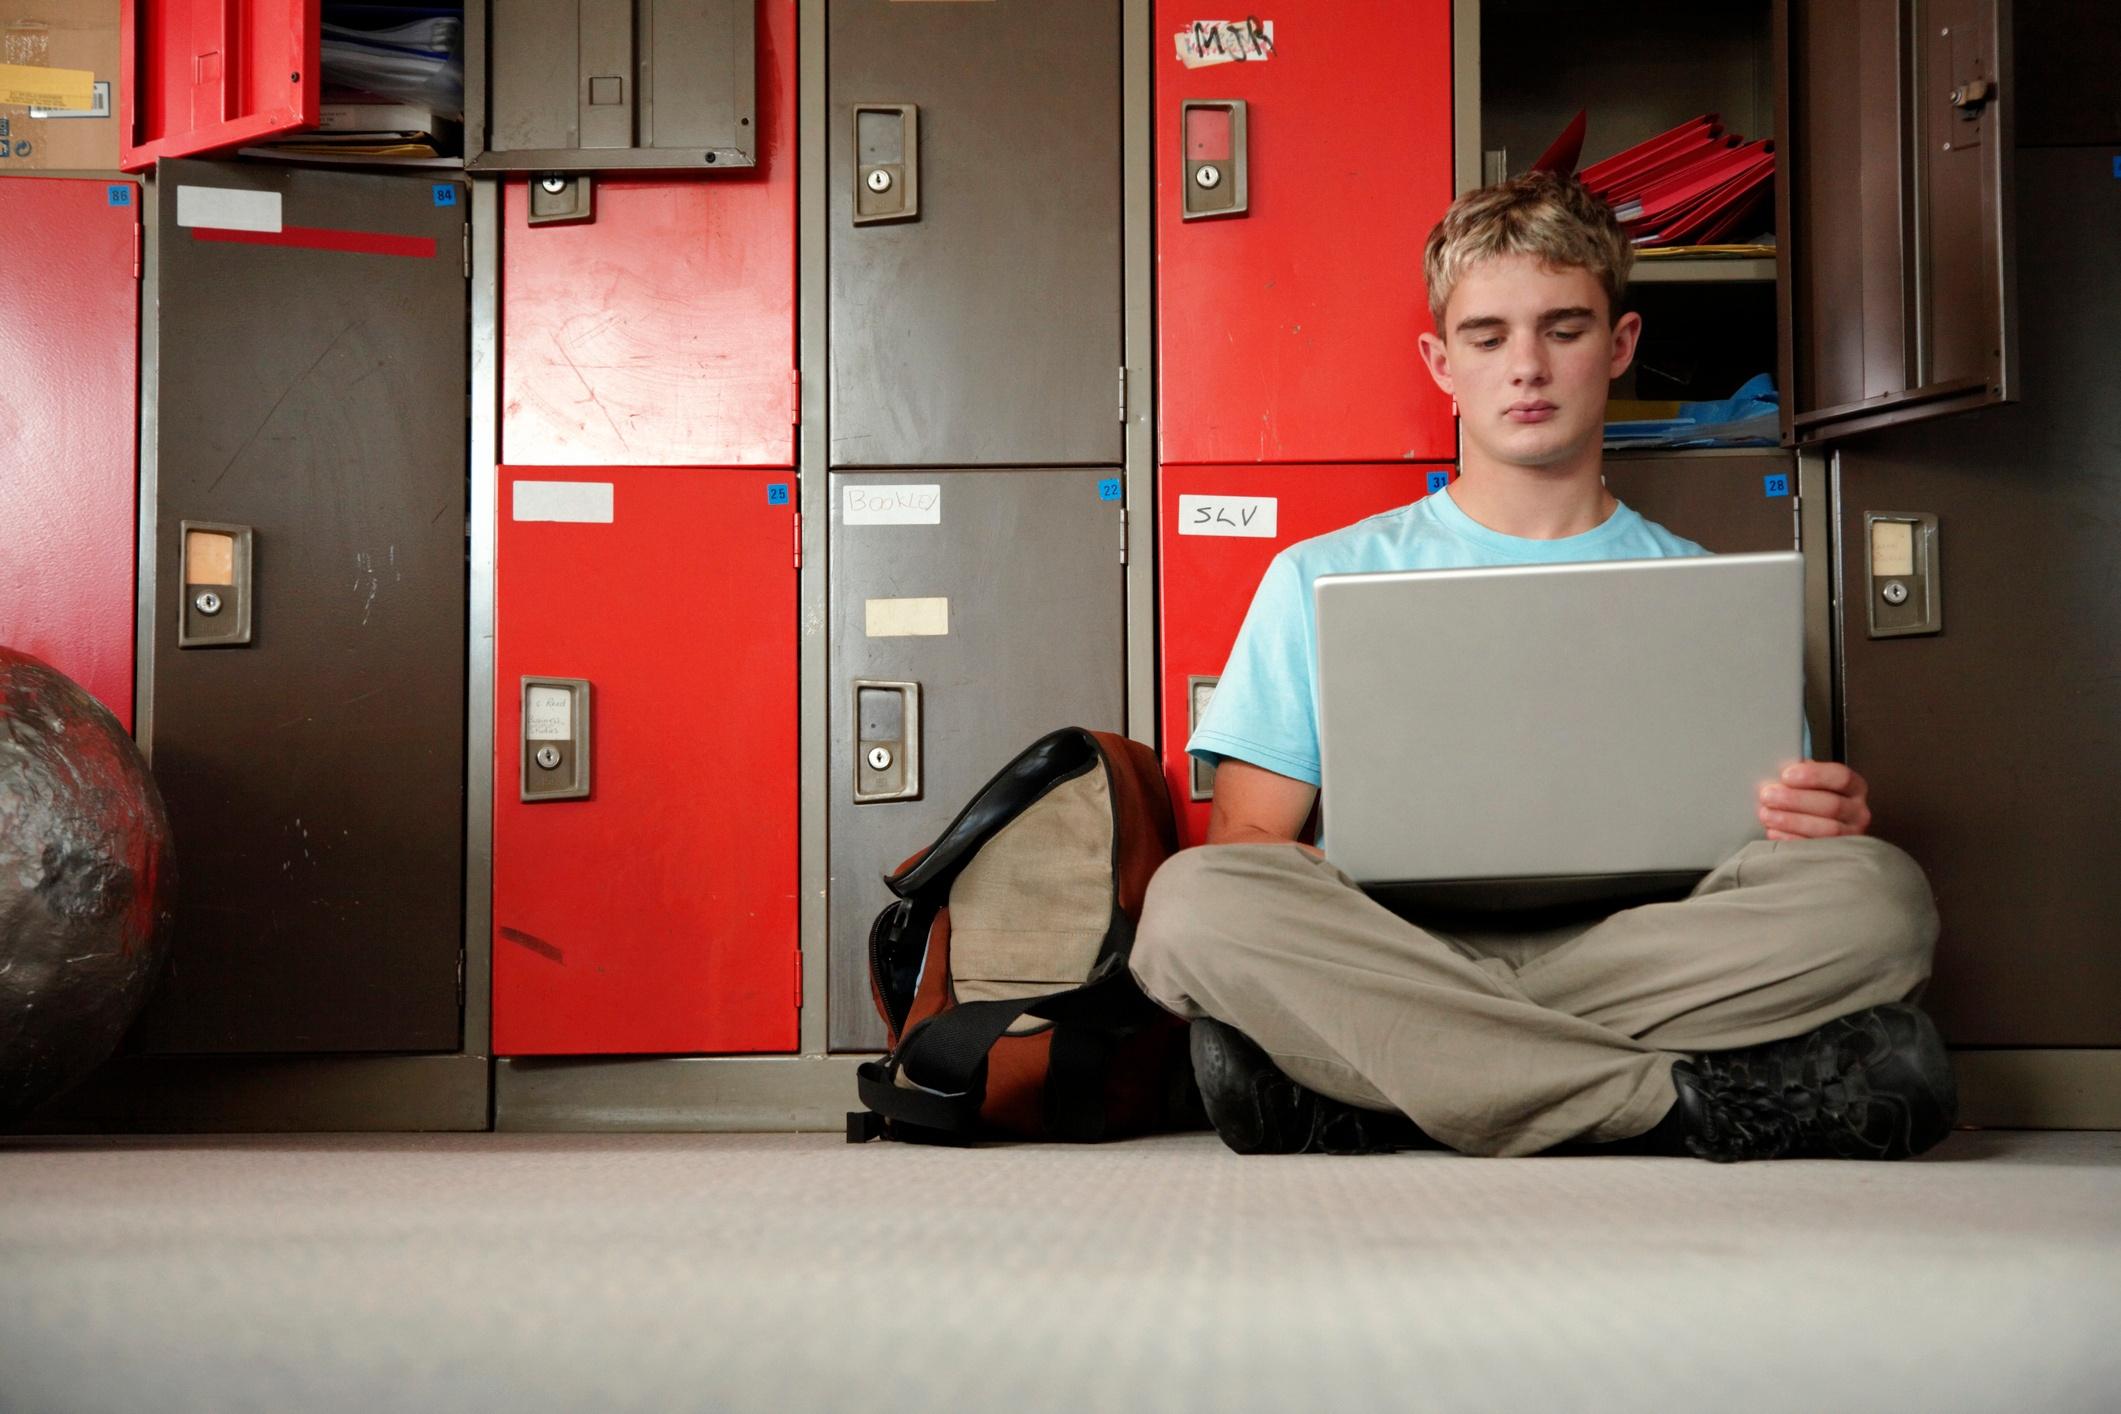 cyberthieves-are-targeting-student-data-2.jpg